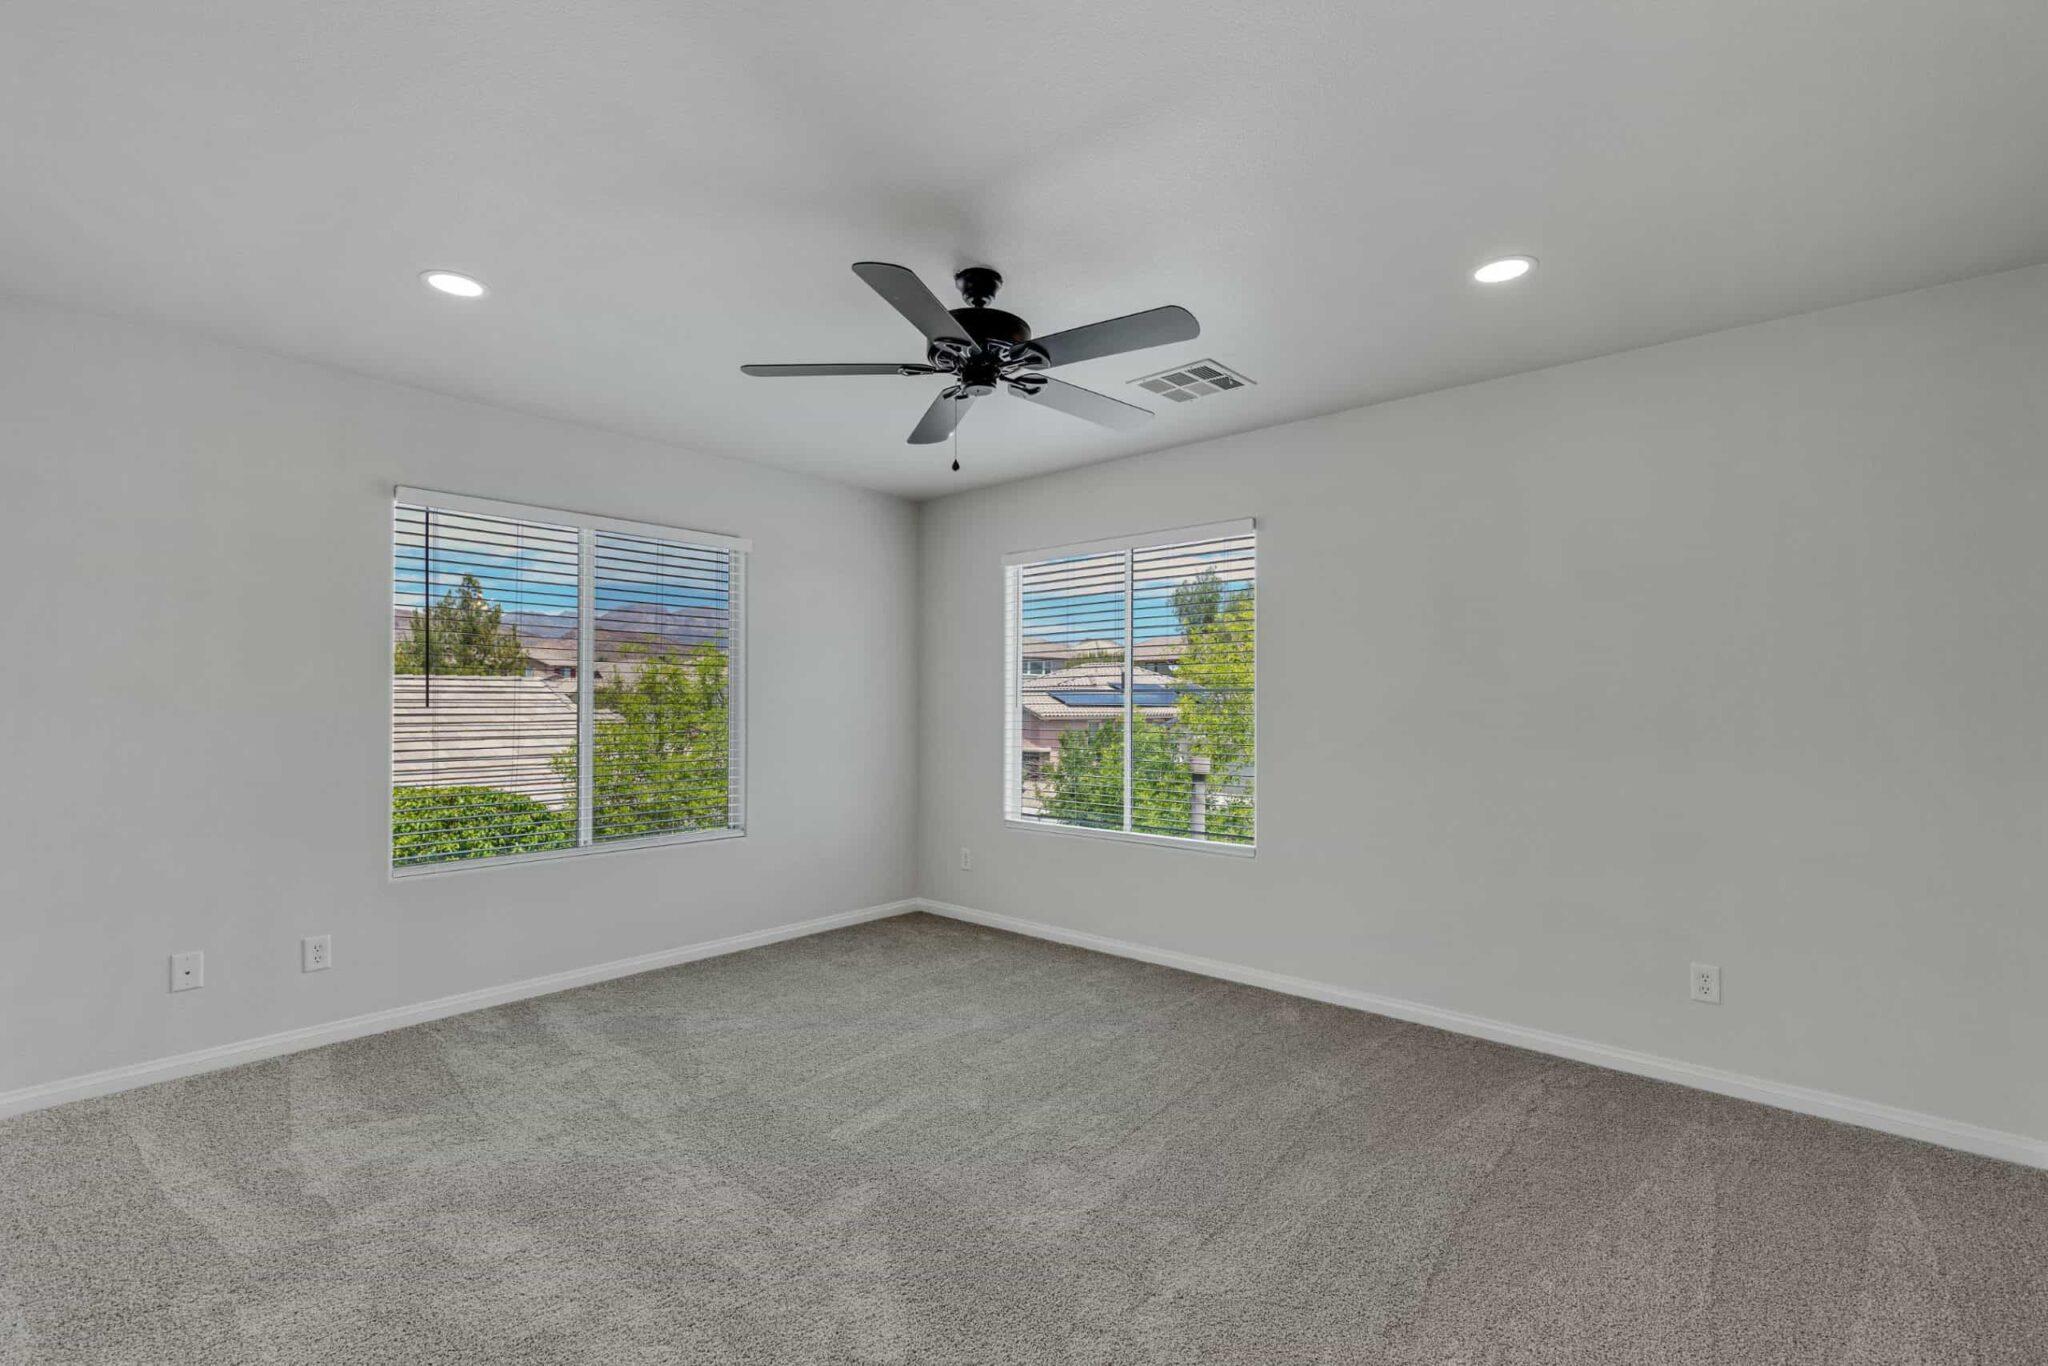 las-vegas-luxry-real-estate-realtor-rob-jensen-company-10491-haywood-drive-summerlin52